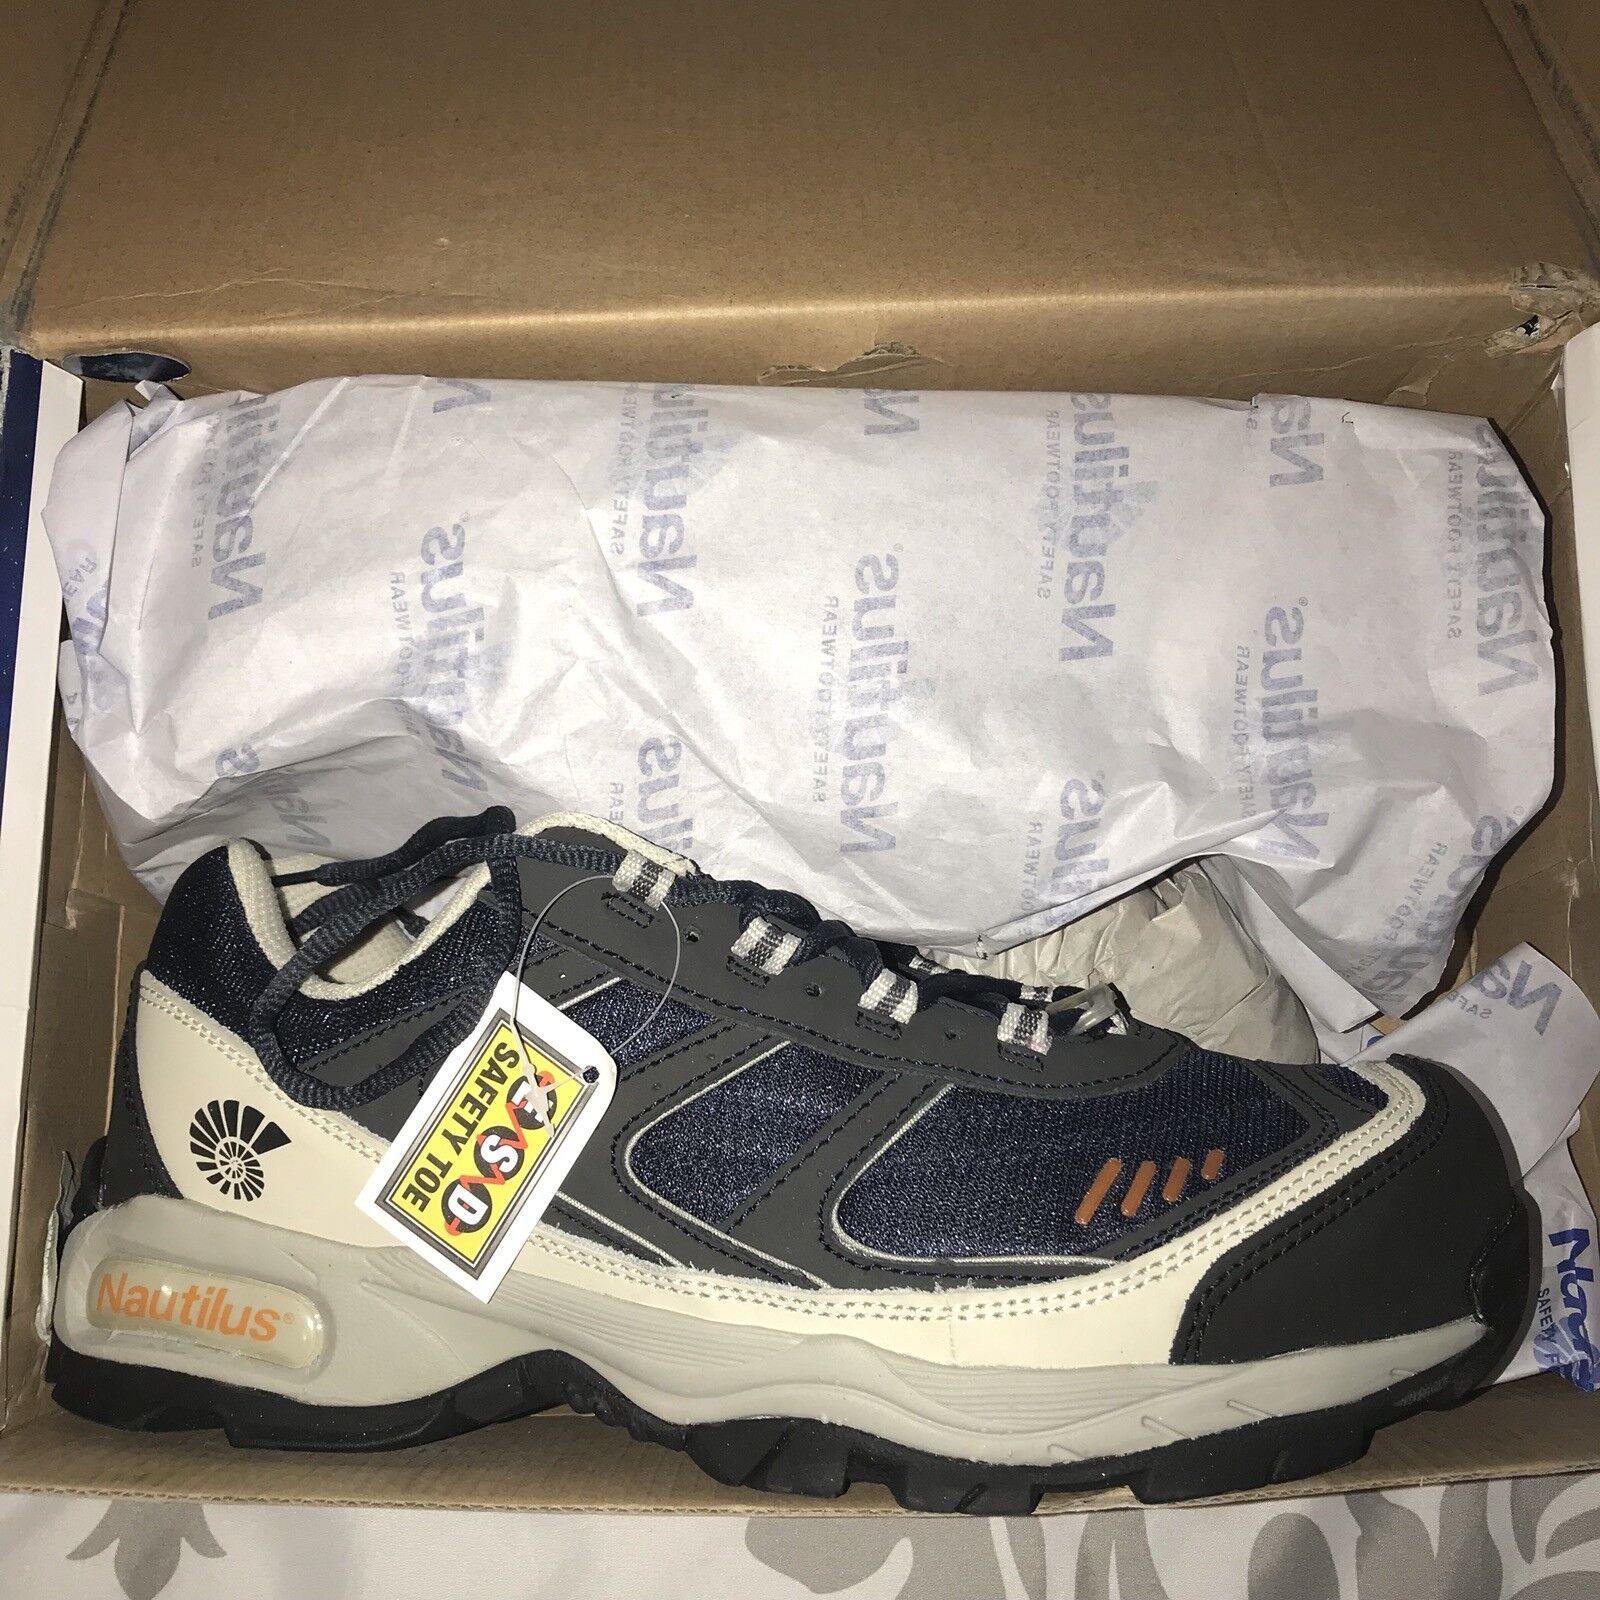 Nautilus Mens bluee ESD Athletic Work shoes Size 11 - Steel Toe N1326